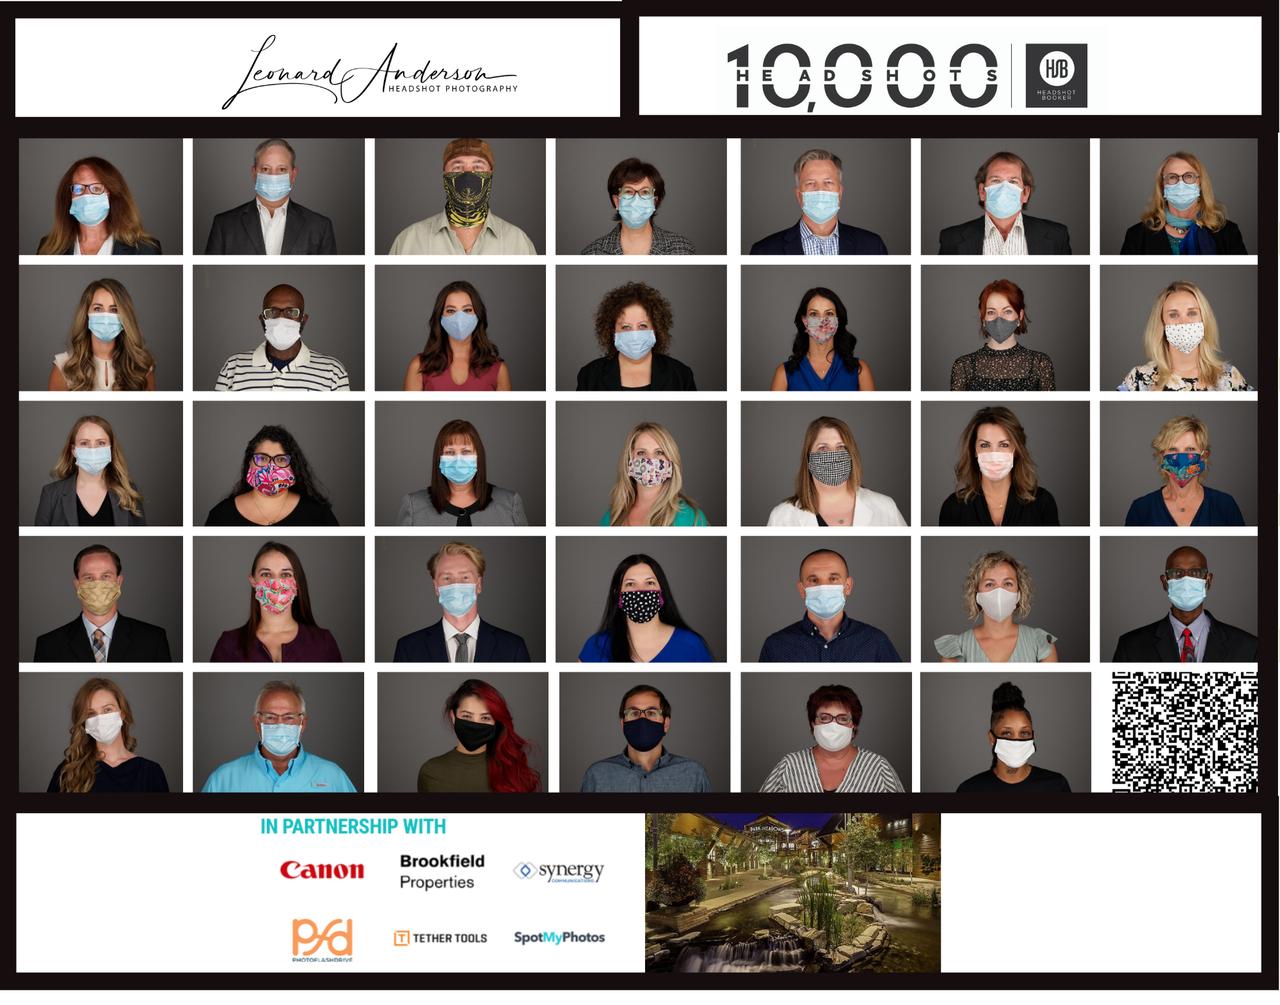 00_leonard anderson photo - 10,000 unmasked headshots.png